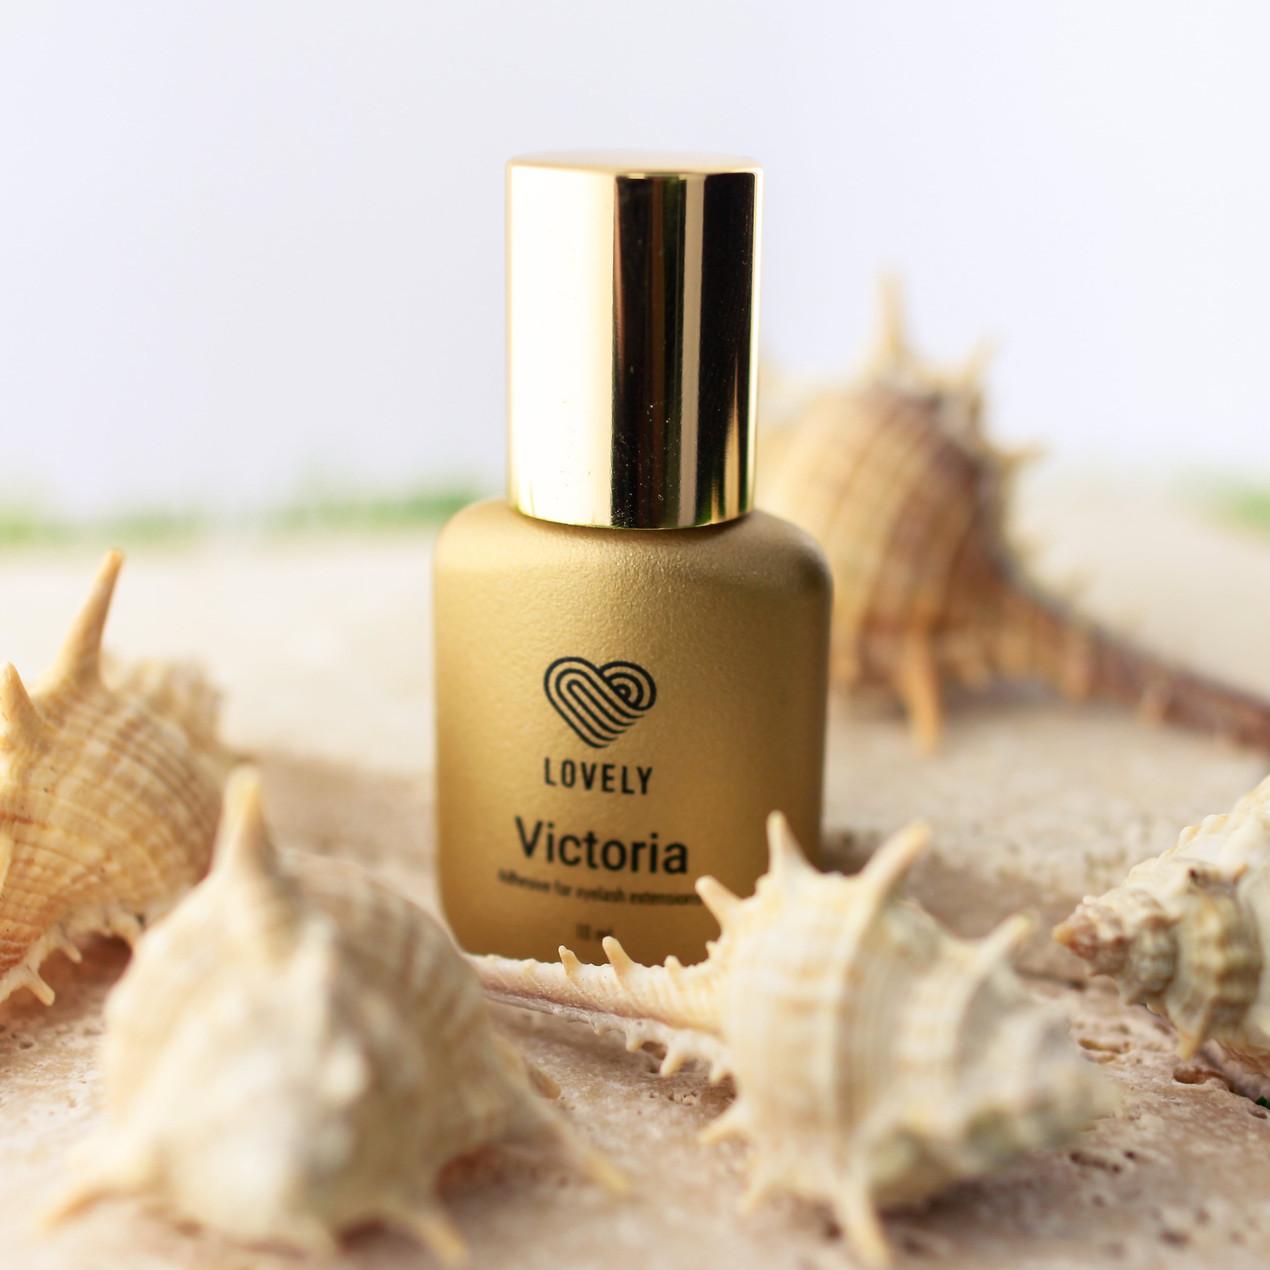 LOVELY Victoria glue